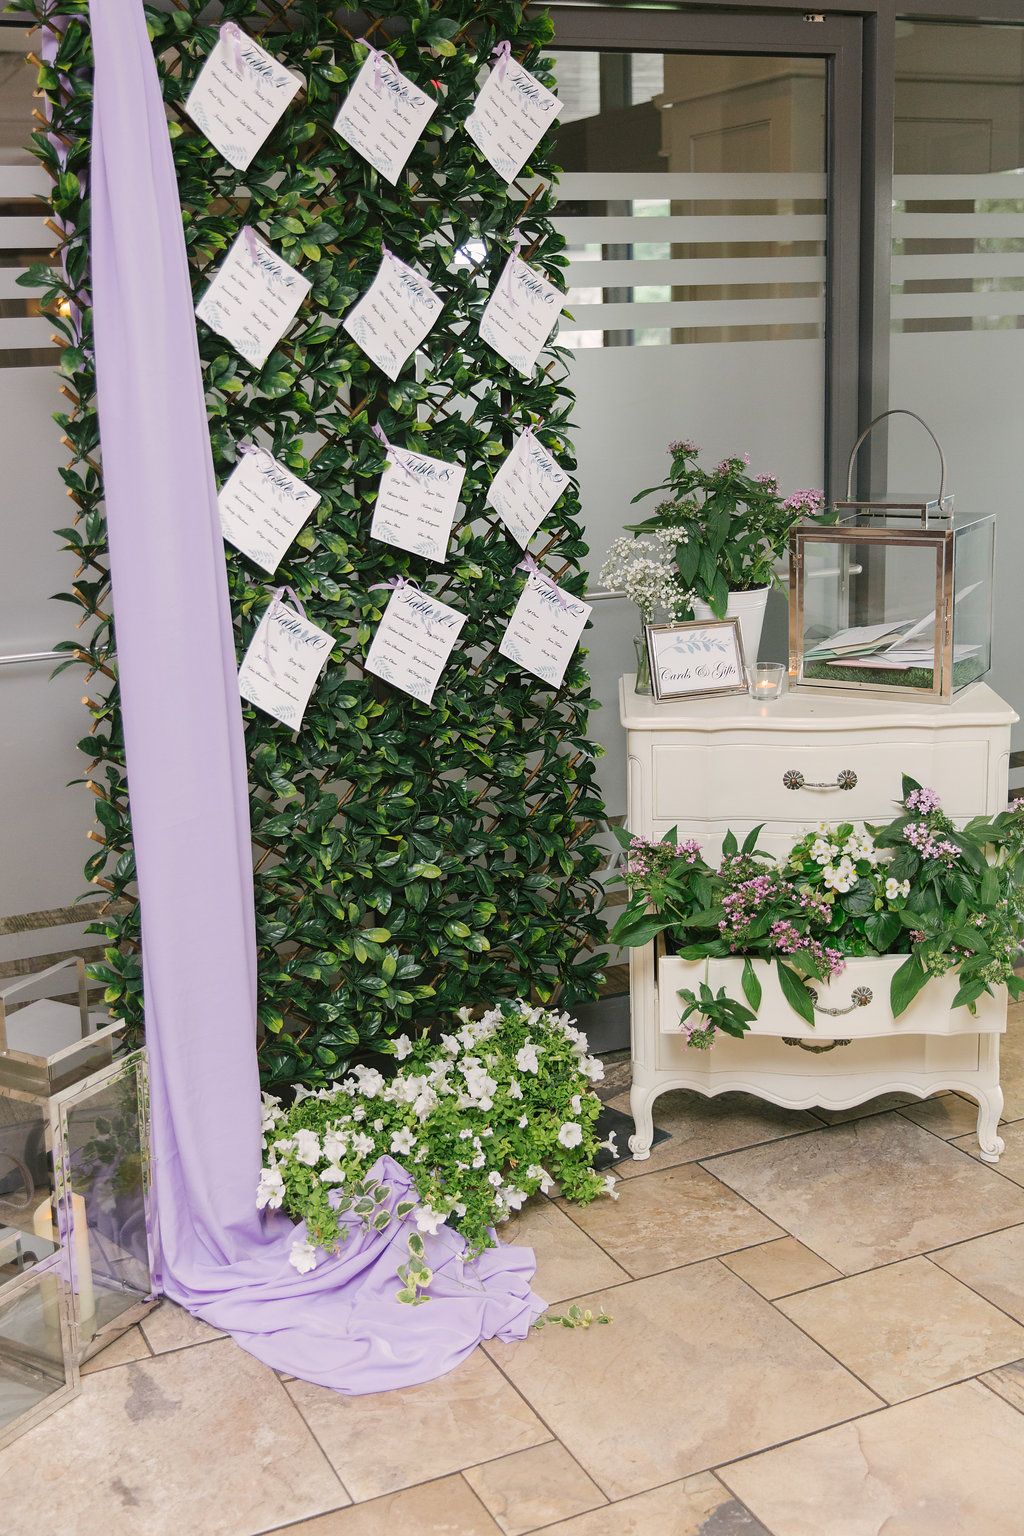 Purple Vintage Garden Seating Chart | spunkysapphire.com